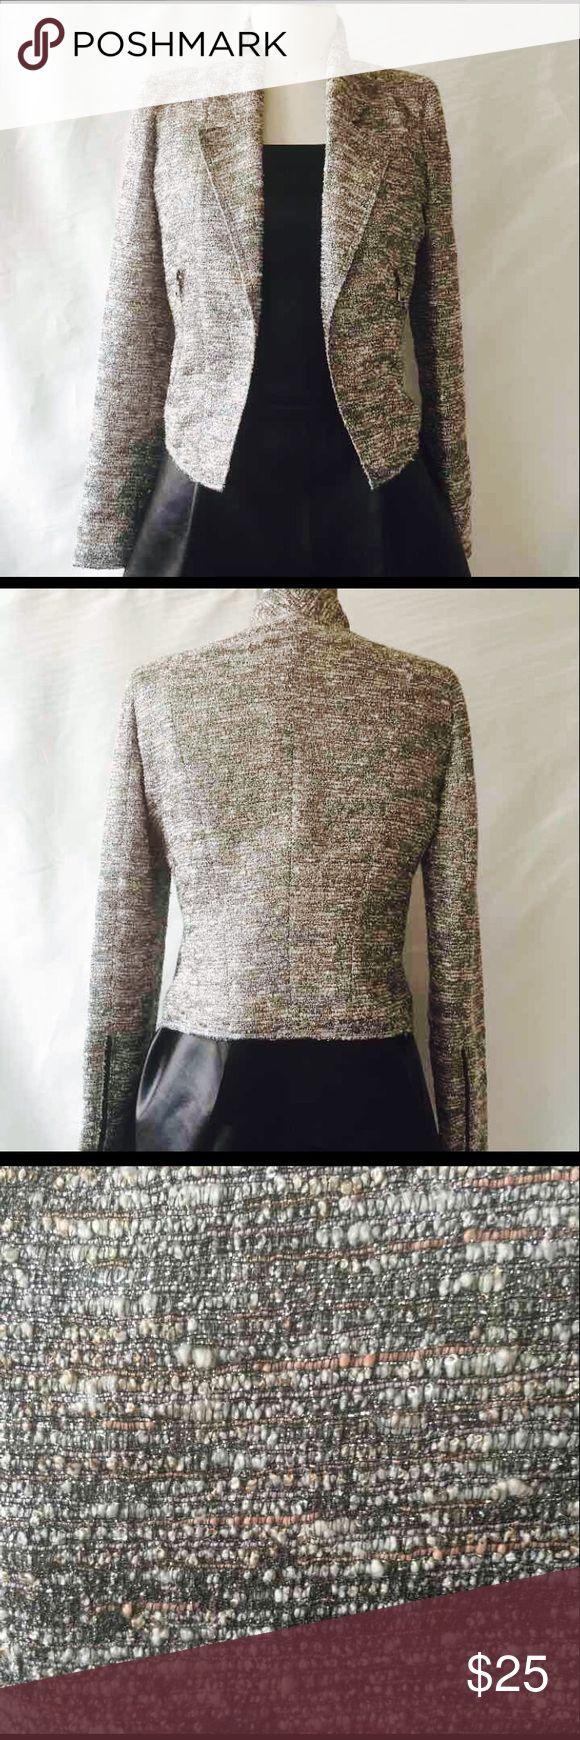 Zara jacket size S Zara jacket size S Zara Jackets & Coats Blazers